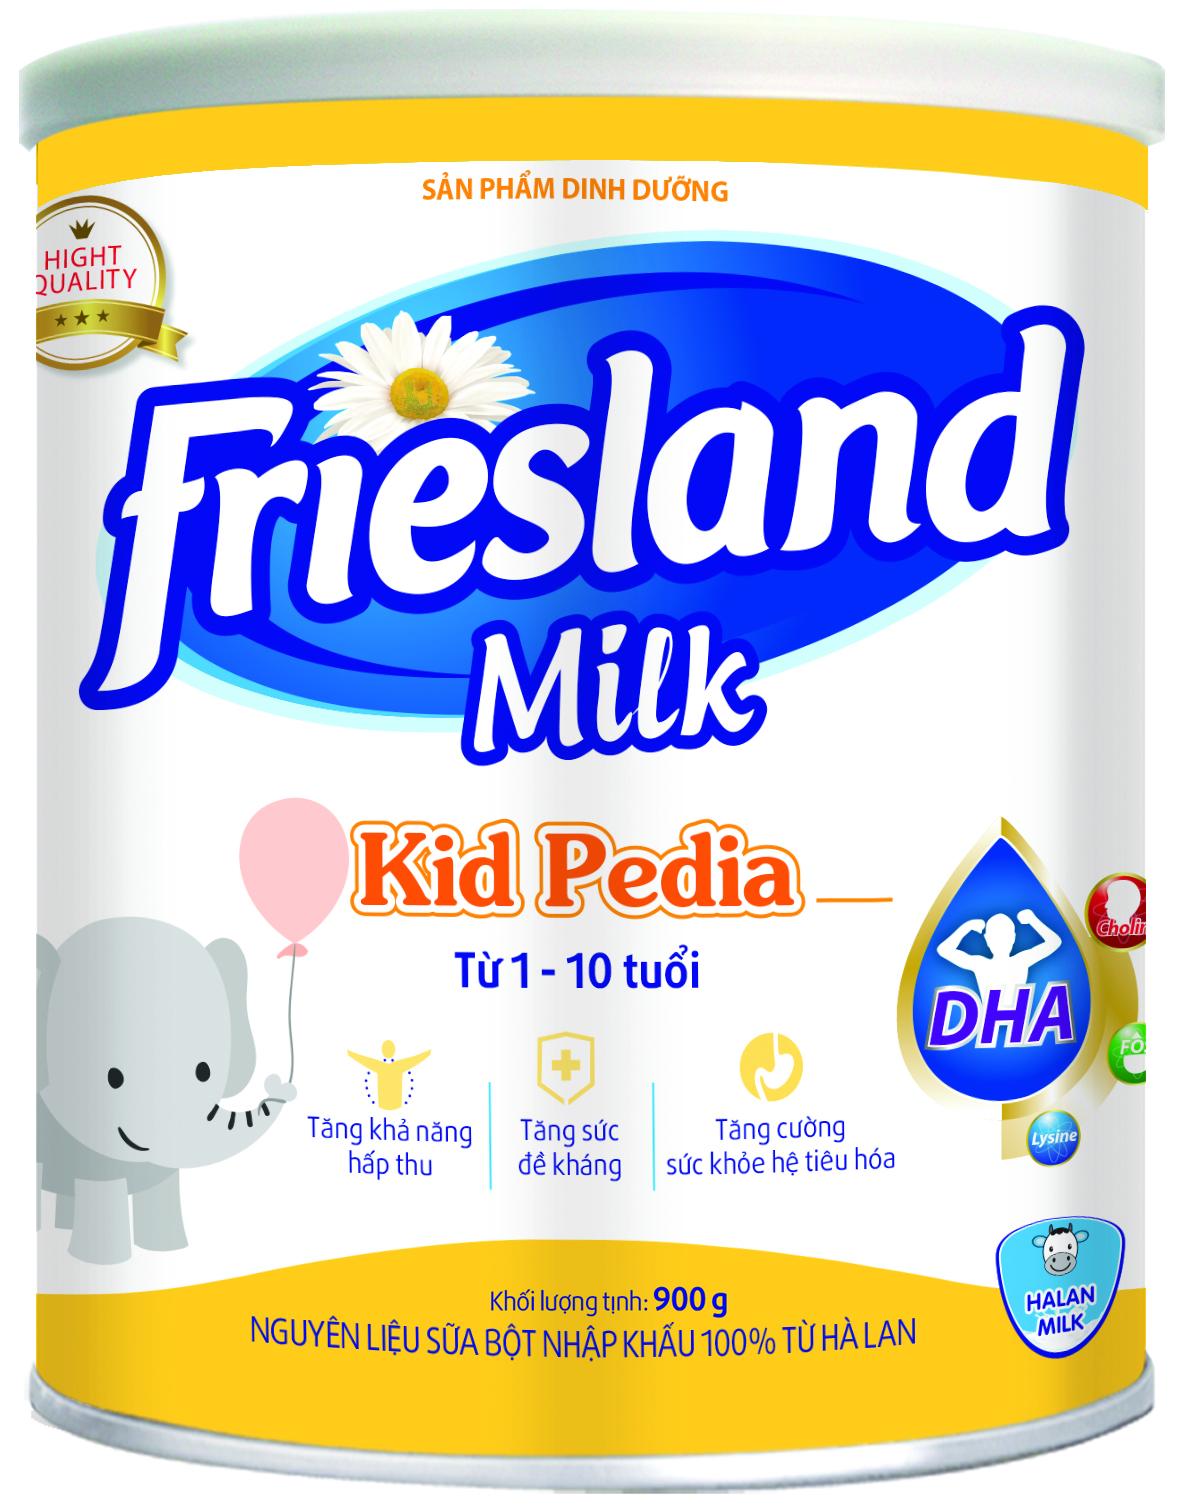 FRIESLAND MILK KIDS PEDIA 900g